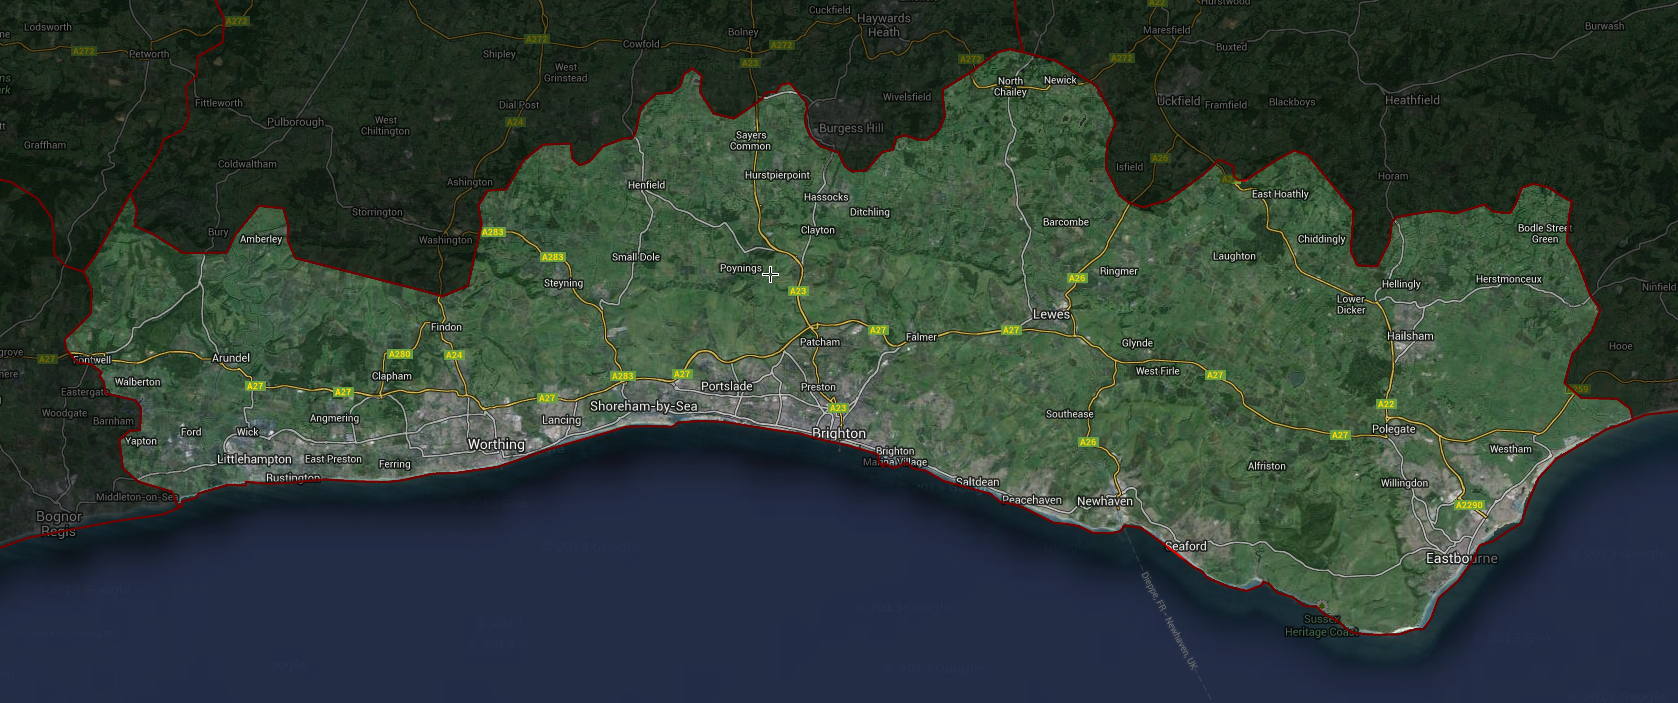 BN postcode map